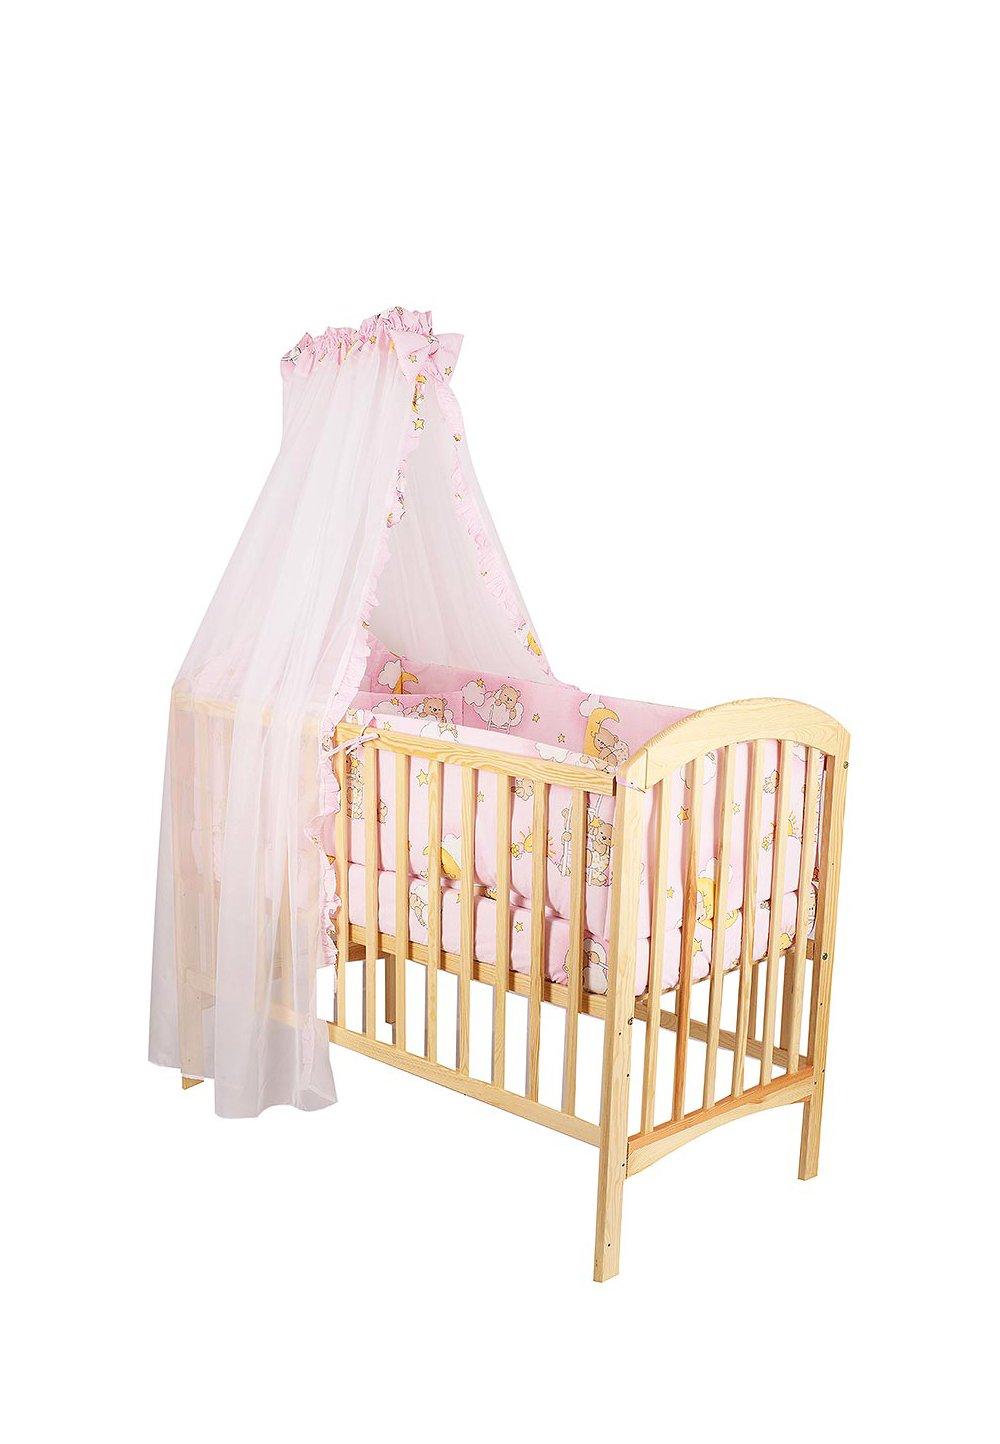 Lenjerie cu baldachin, 6 piese. ursuletul somnoros roz, 120x60cm imagine